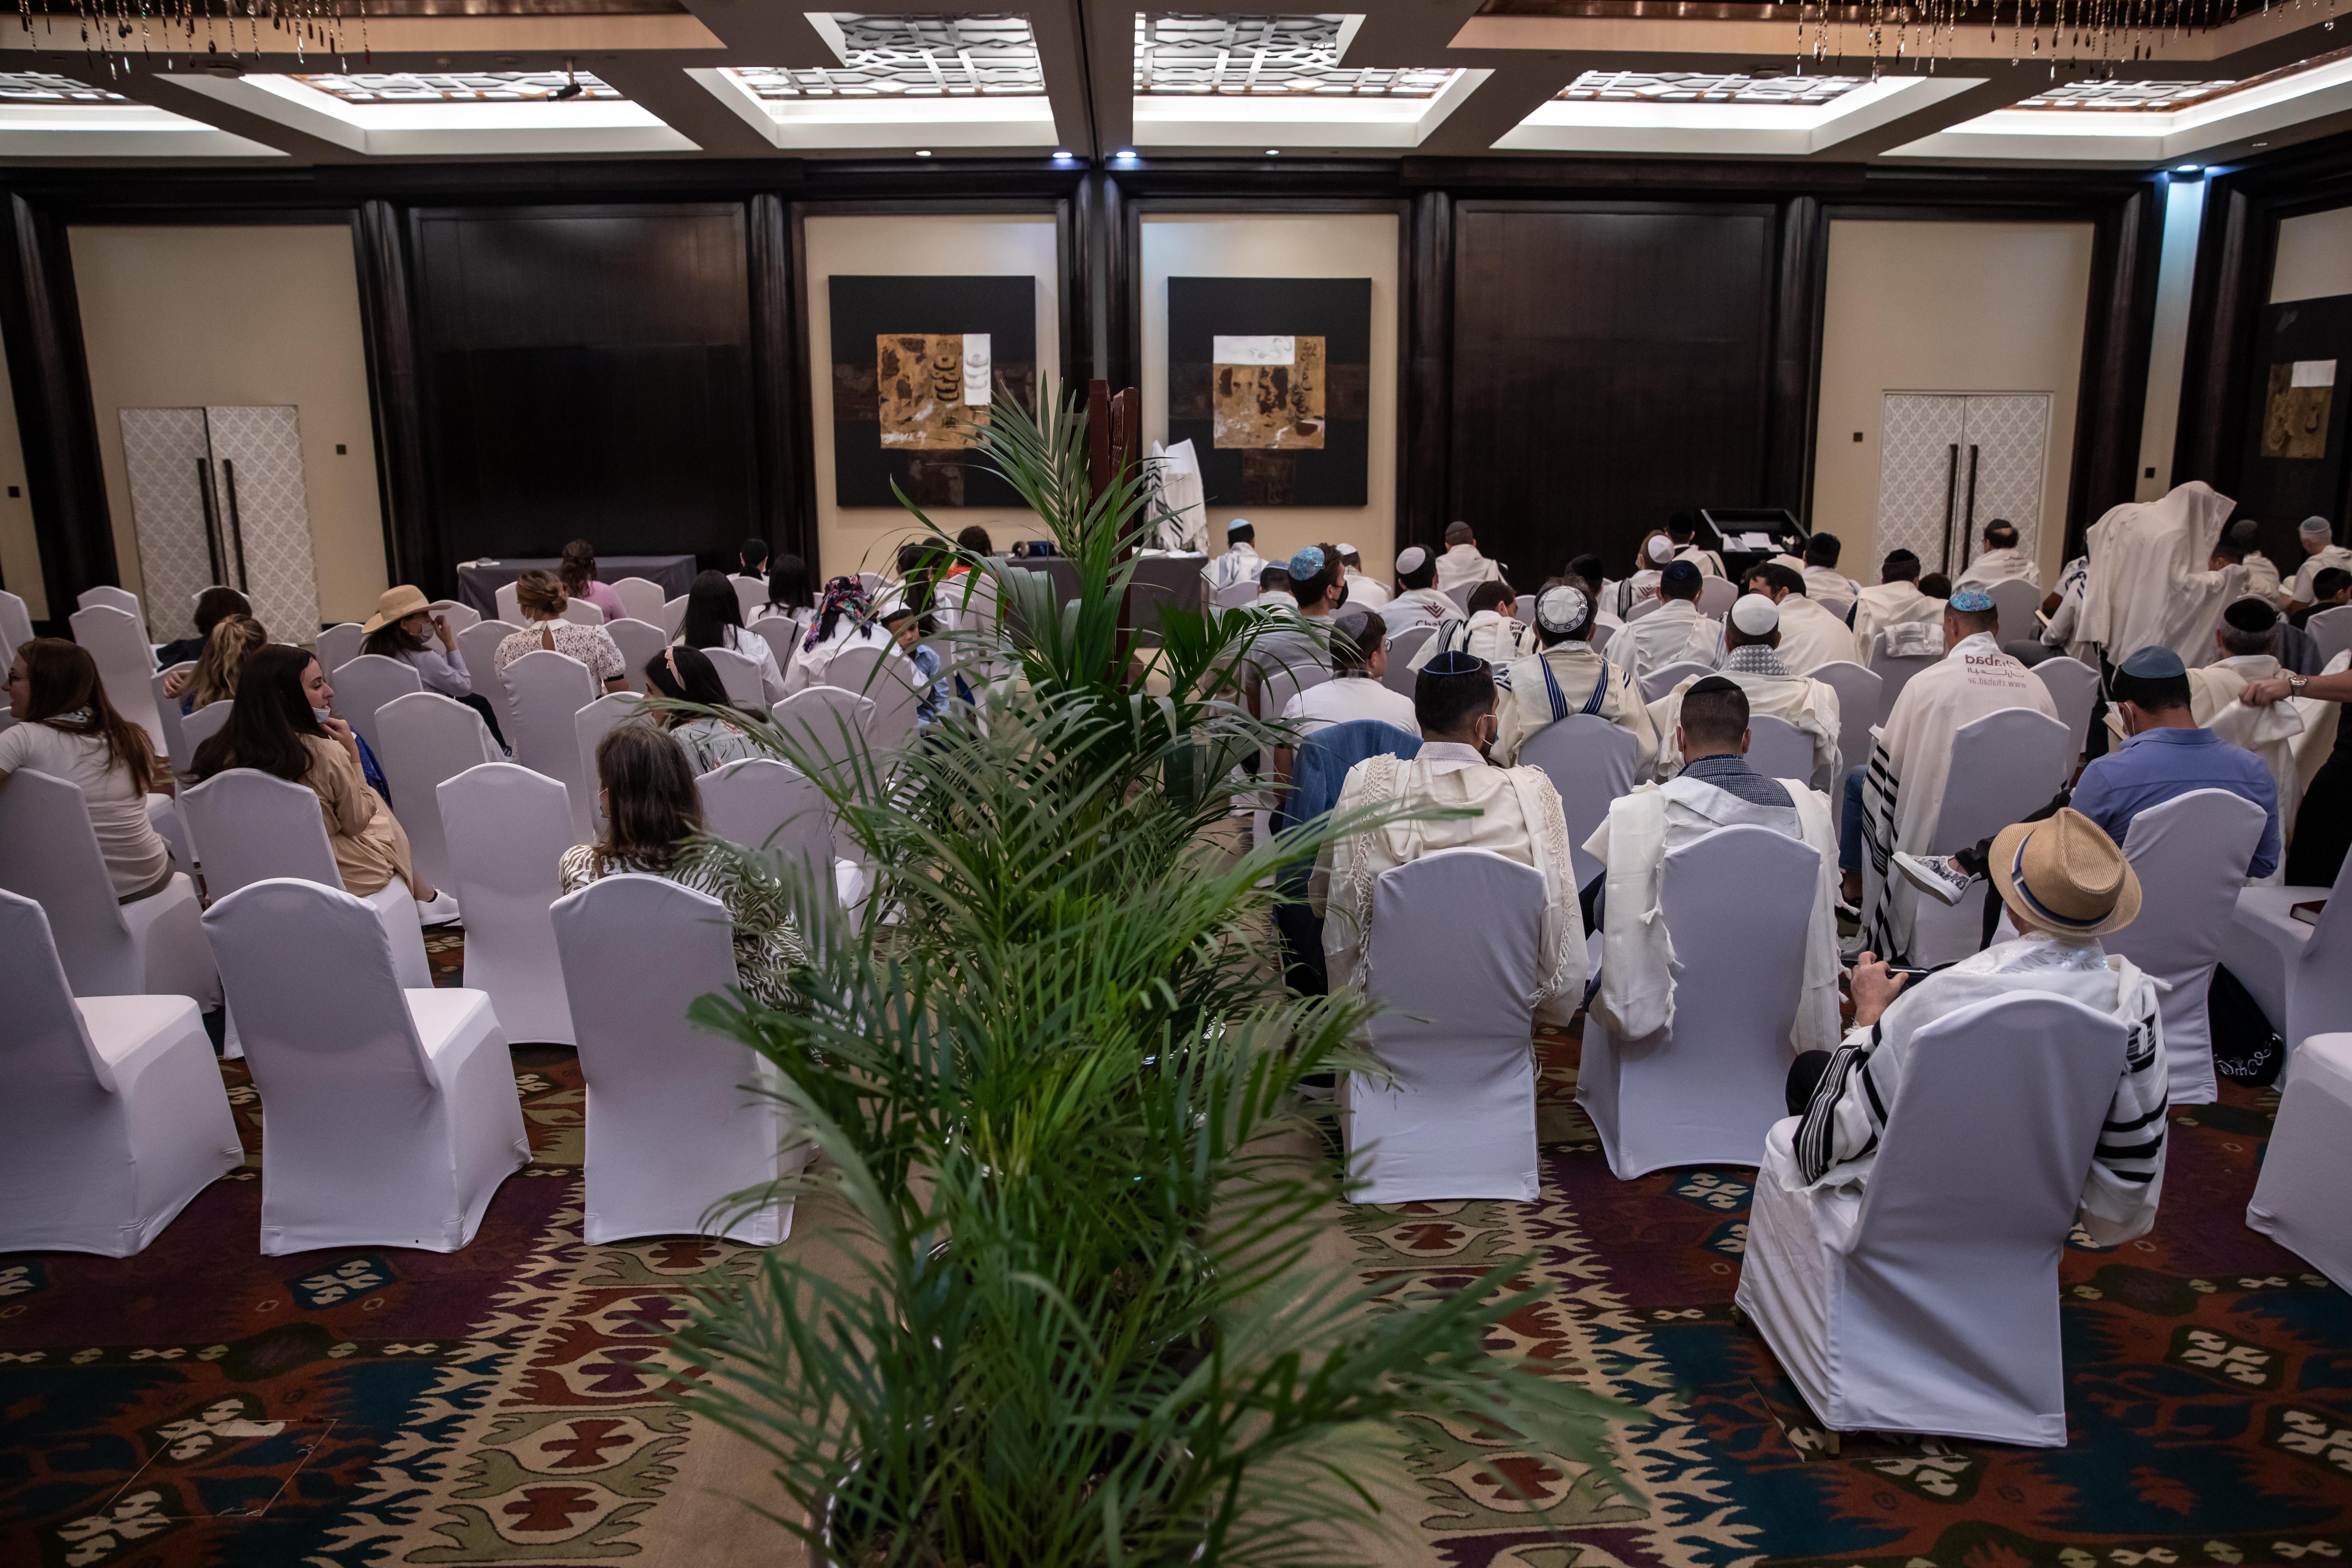 The Jewish Community Center of the United Arab Emirates hosts Yom Kippur prayers in Dubai. Not all Jews go to service on Yom Kippur.